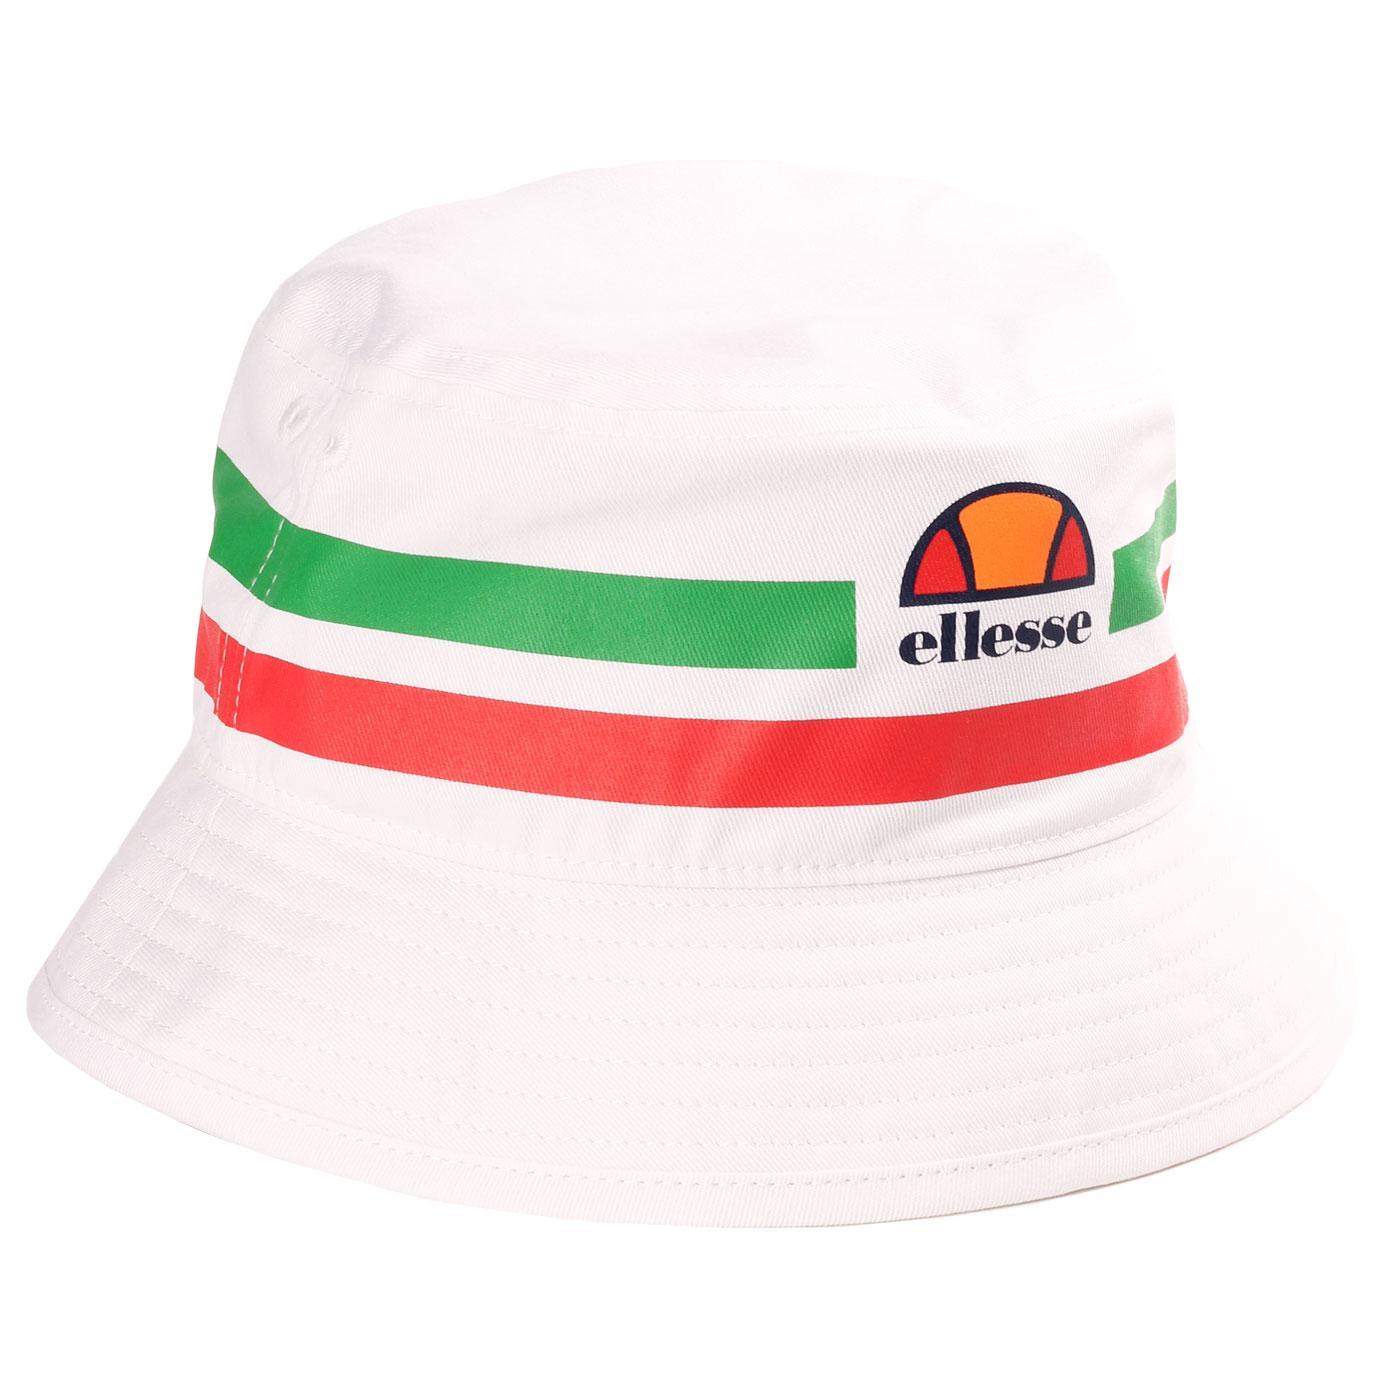 Lanori ELLESSE Retro 90s Bucket Hat (Italy)